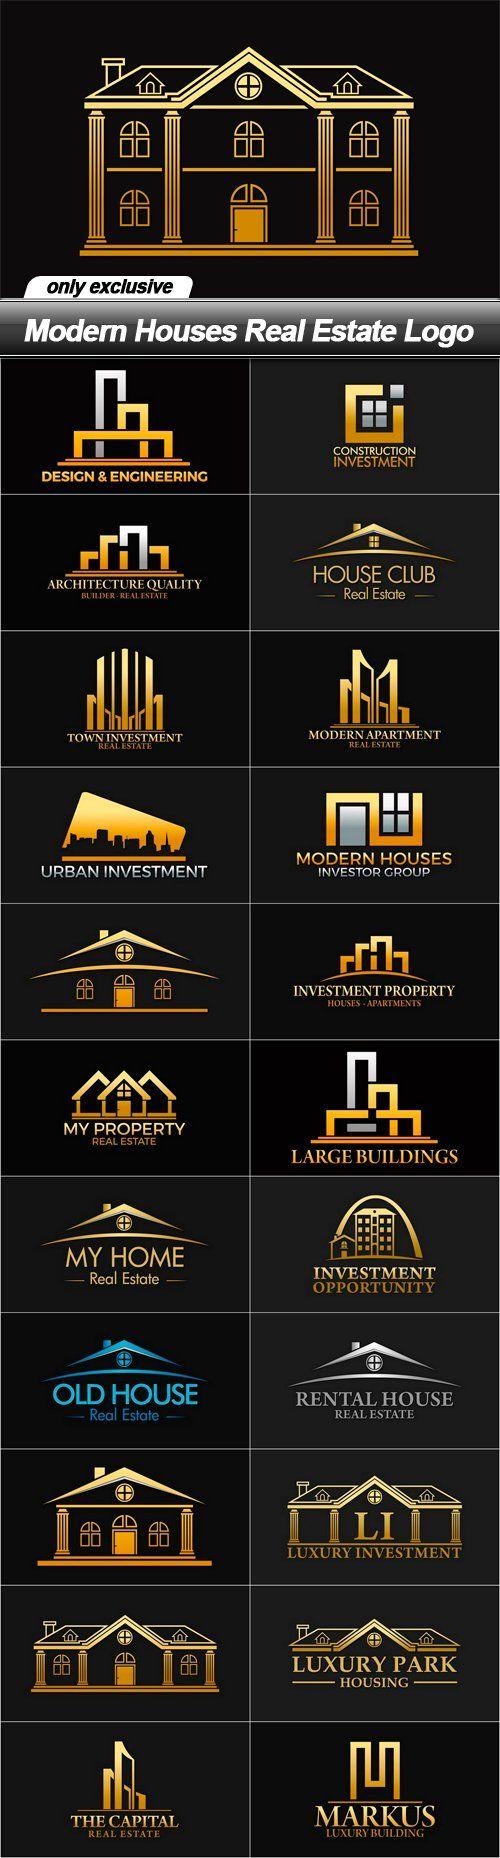 Modern Houses Real Estate Logo                                                                                                                                                                                 More